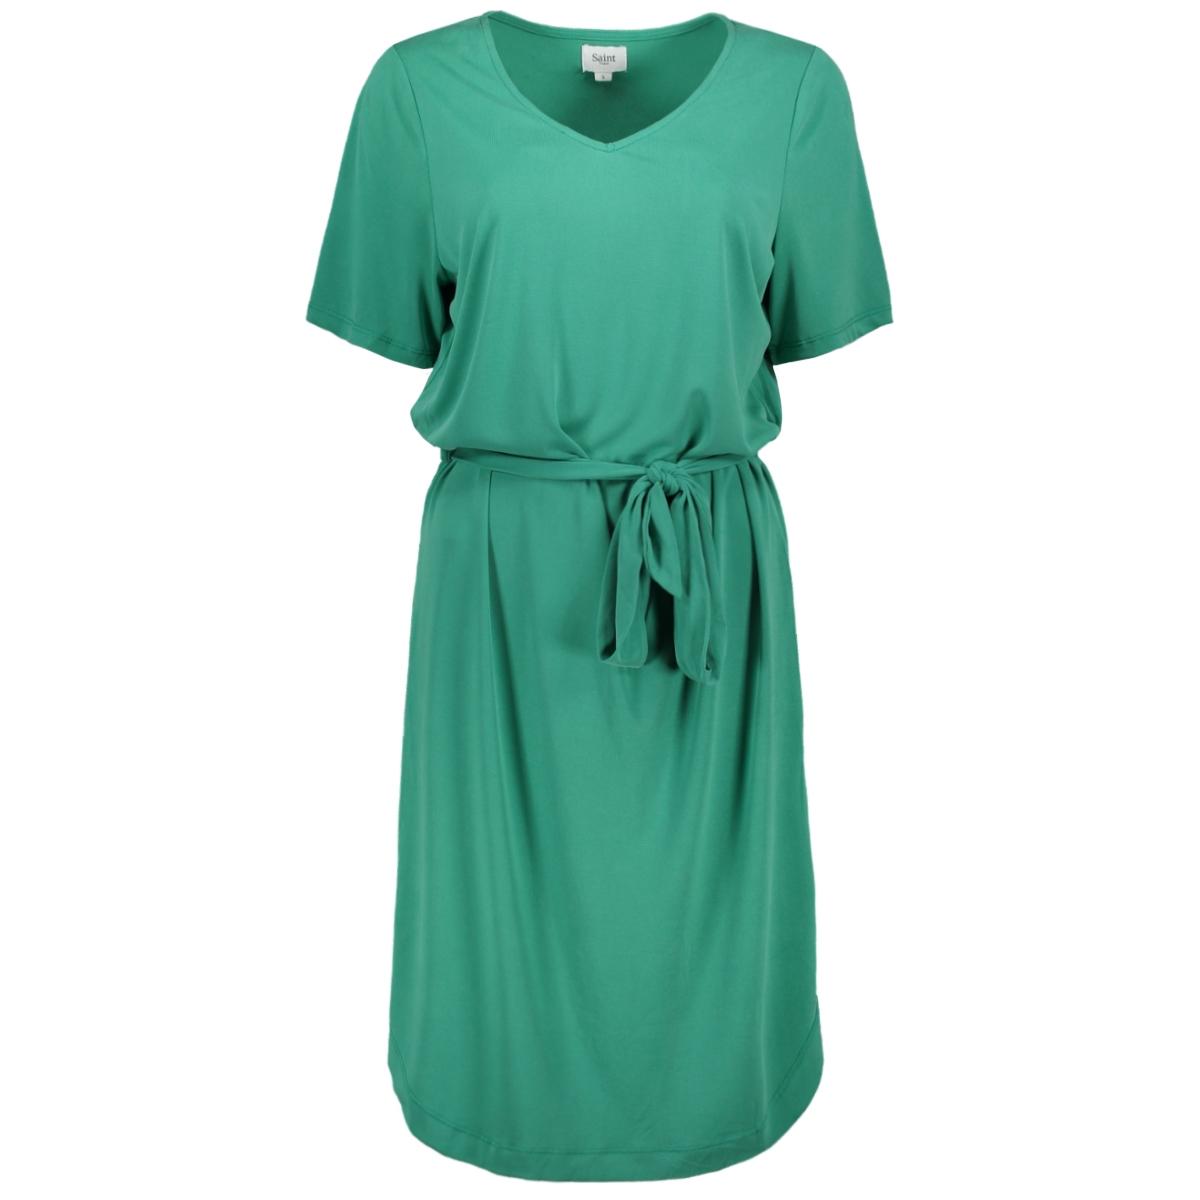 jersey dress u6501 saint tropez jurk 8310 greenlake